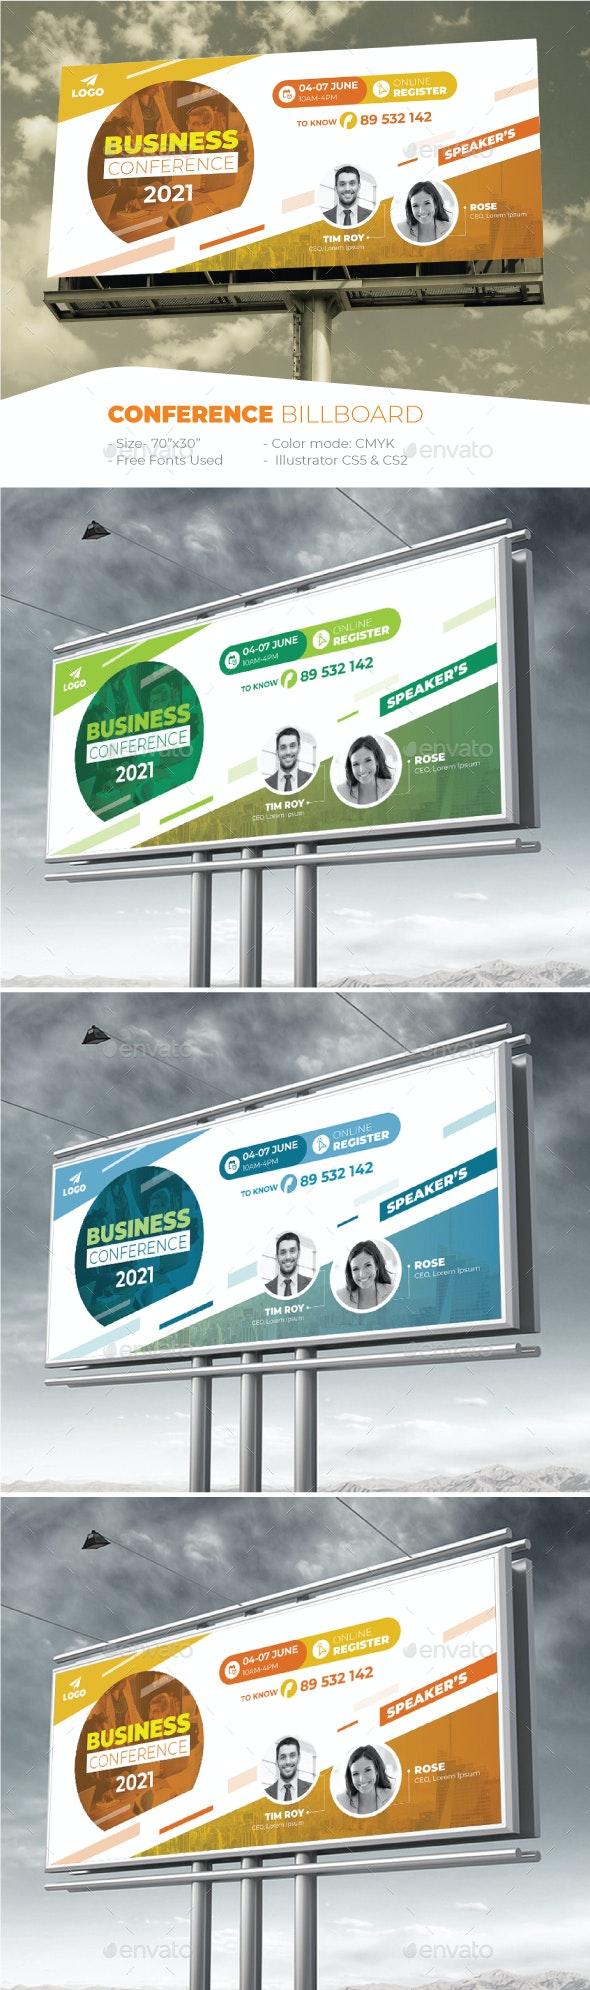 Conference Billboard - Signage Print Templates